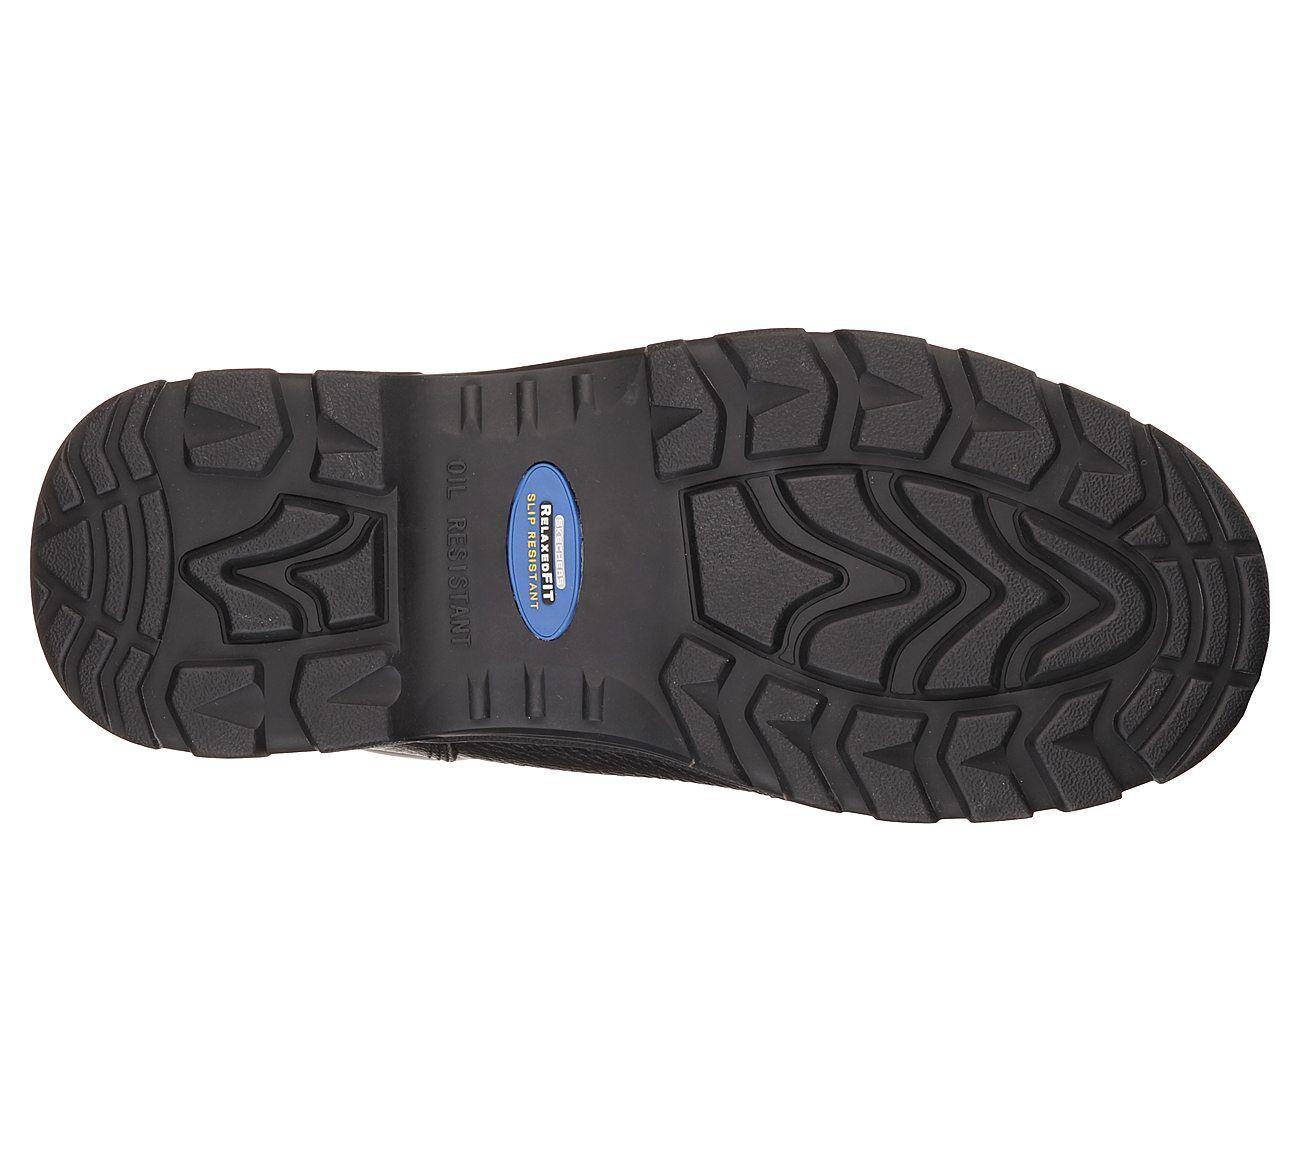 zapatos skechers 2018 new edition ficha tecnica